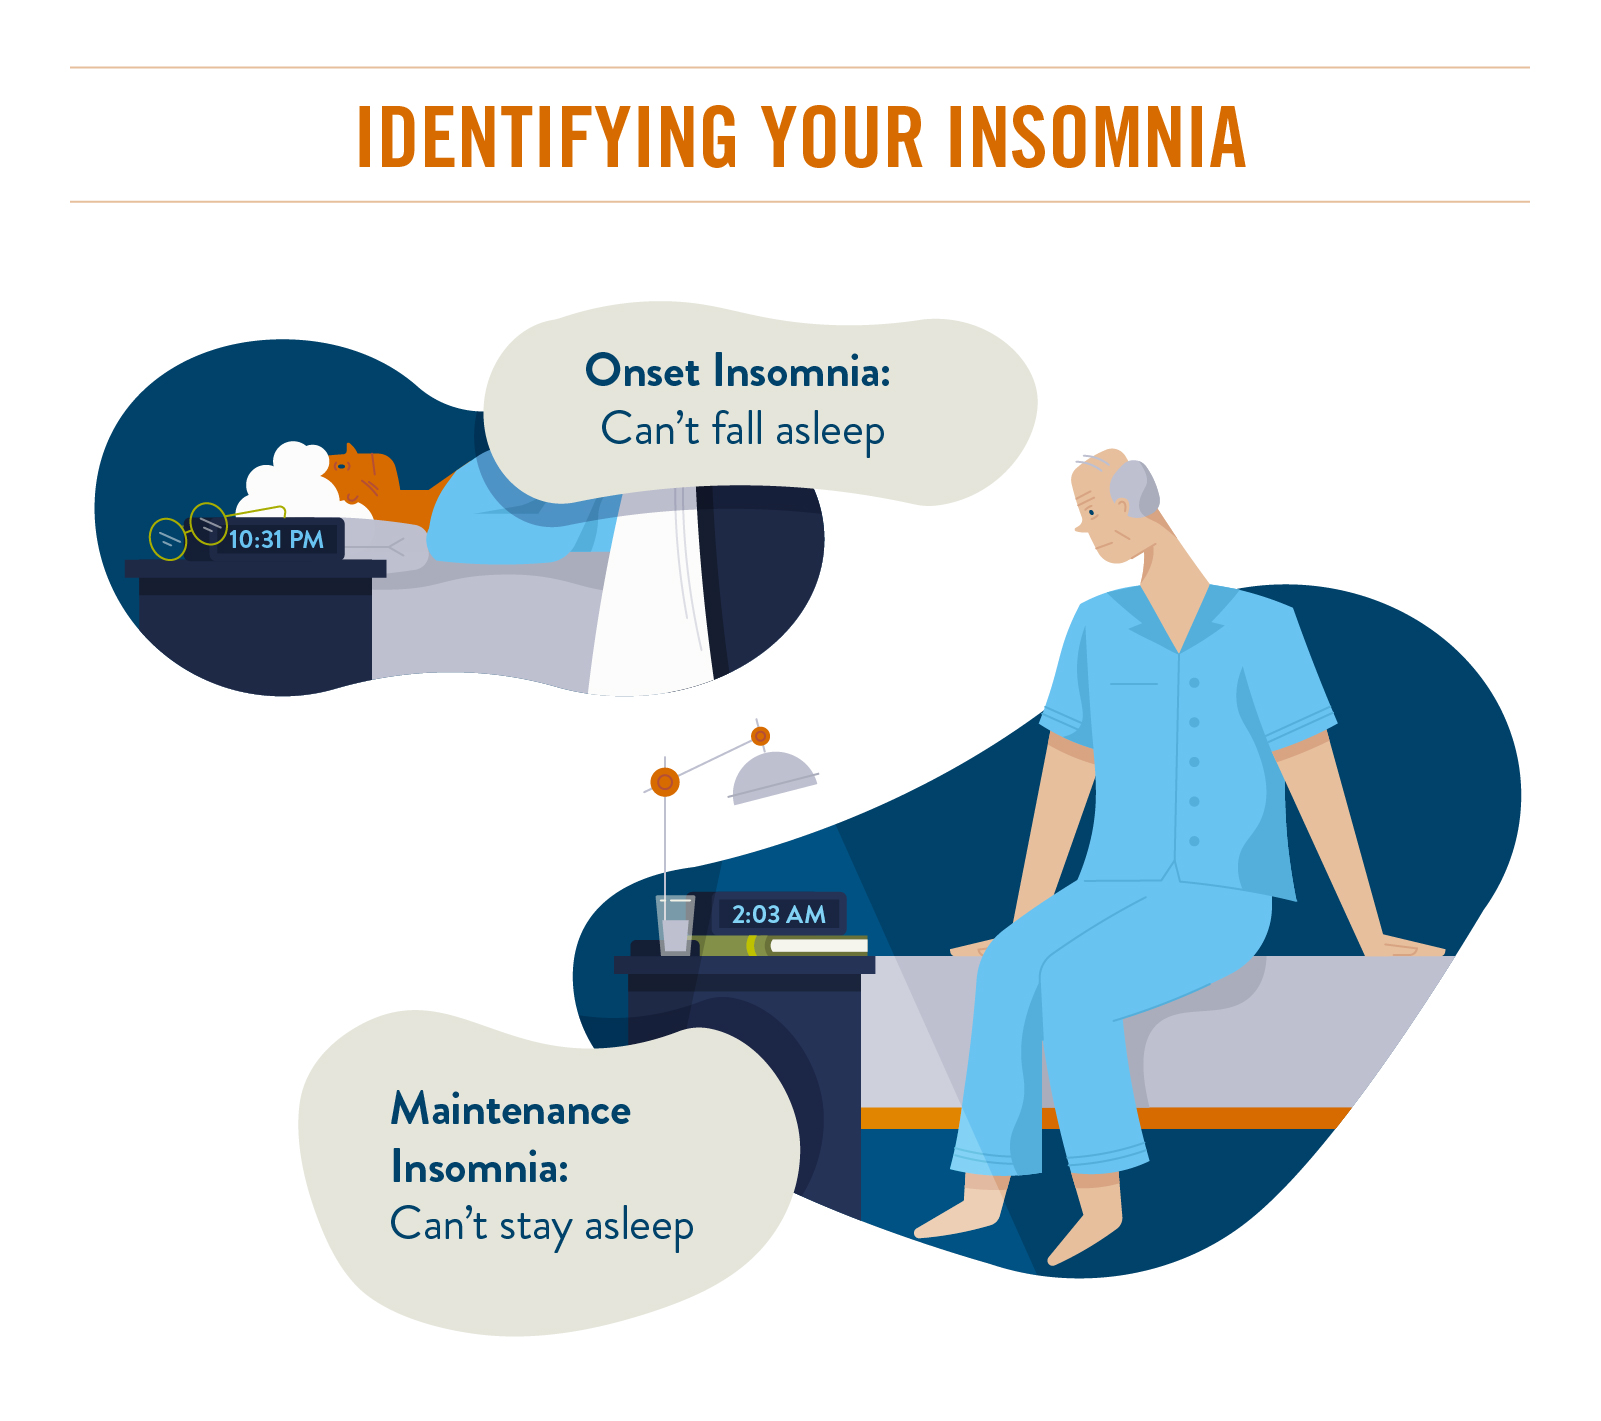 identifying your insomnia